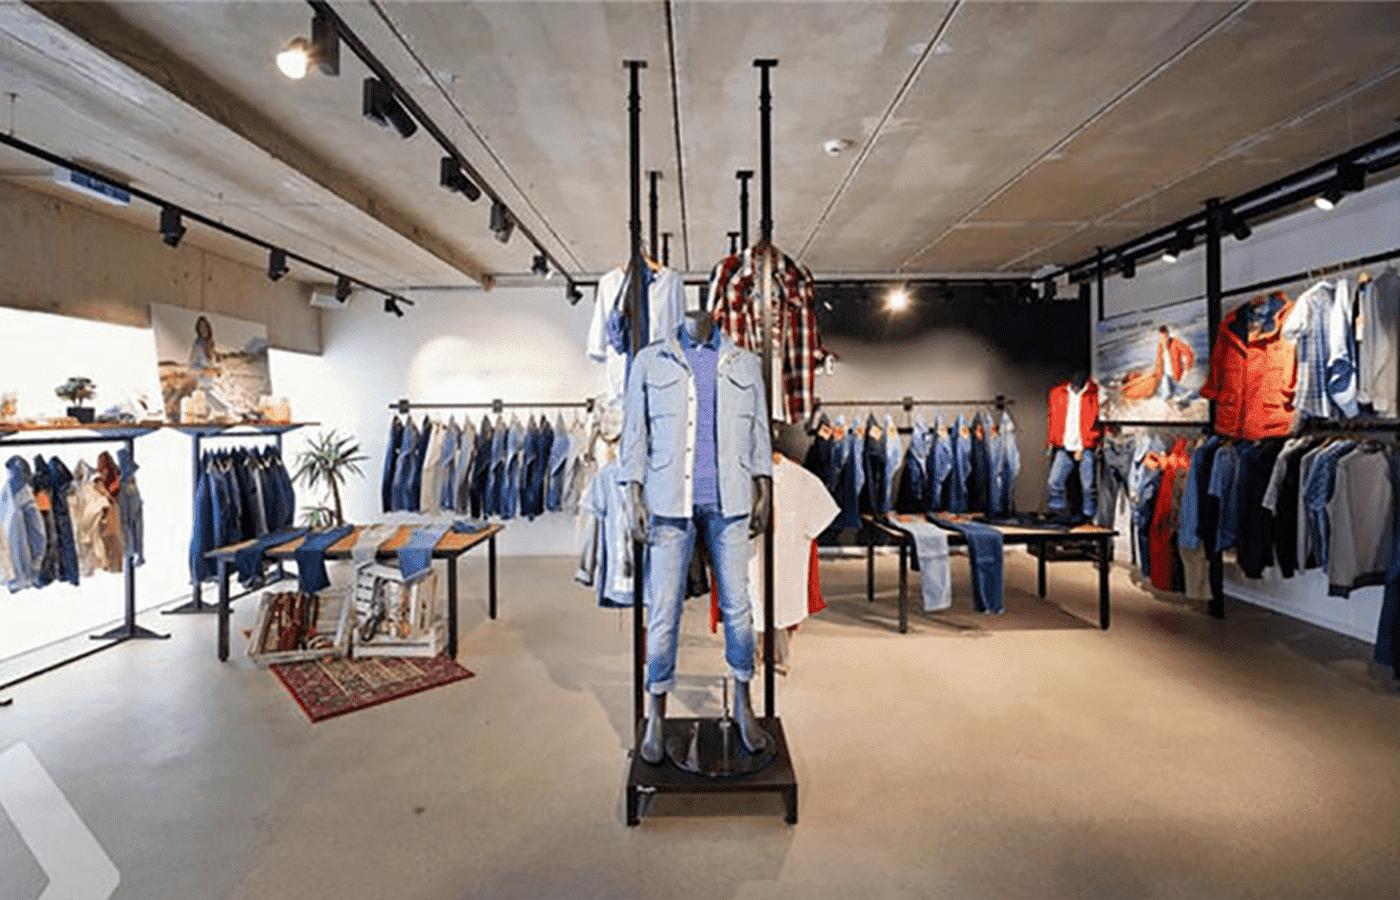 Cheap-Garment-Clothes-Shops-Furniture-Design-938x521